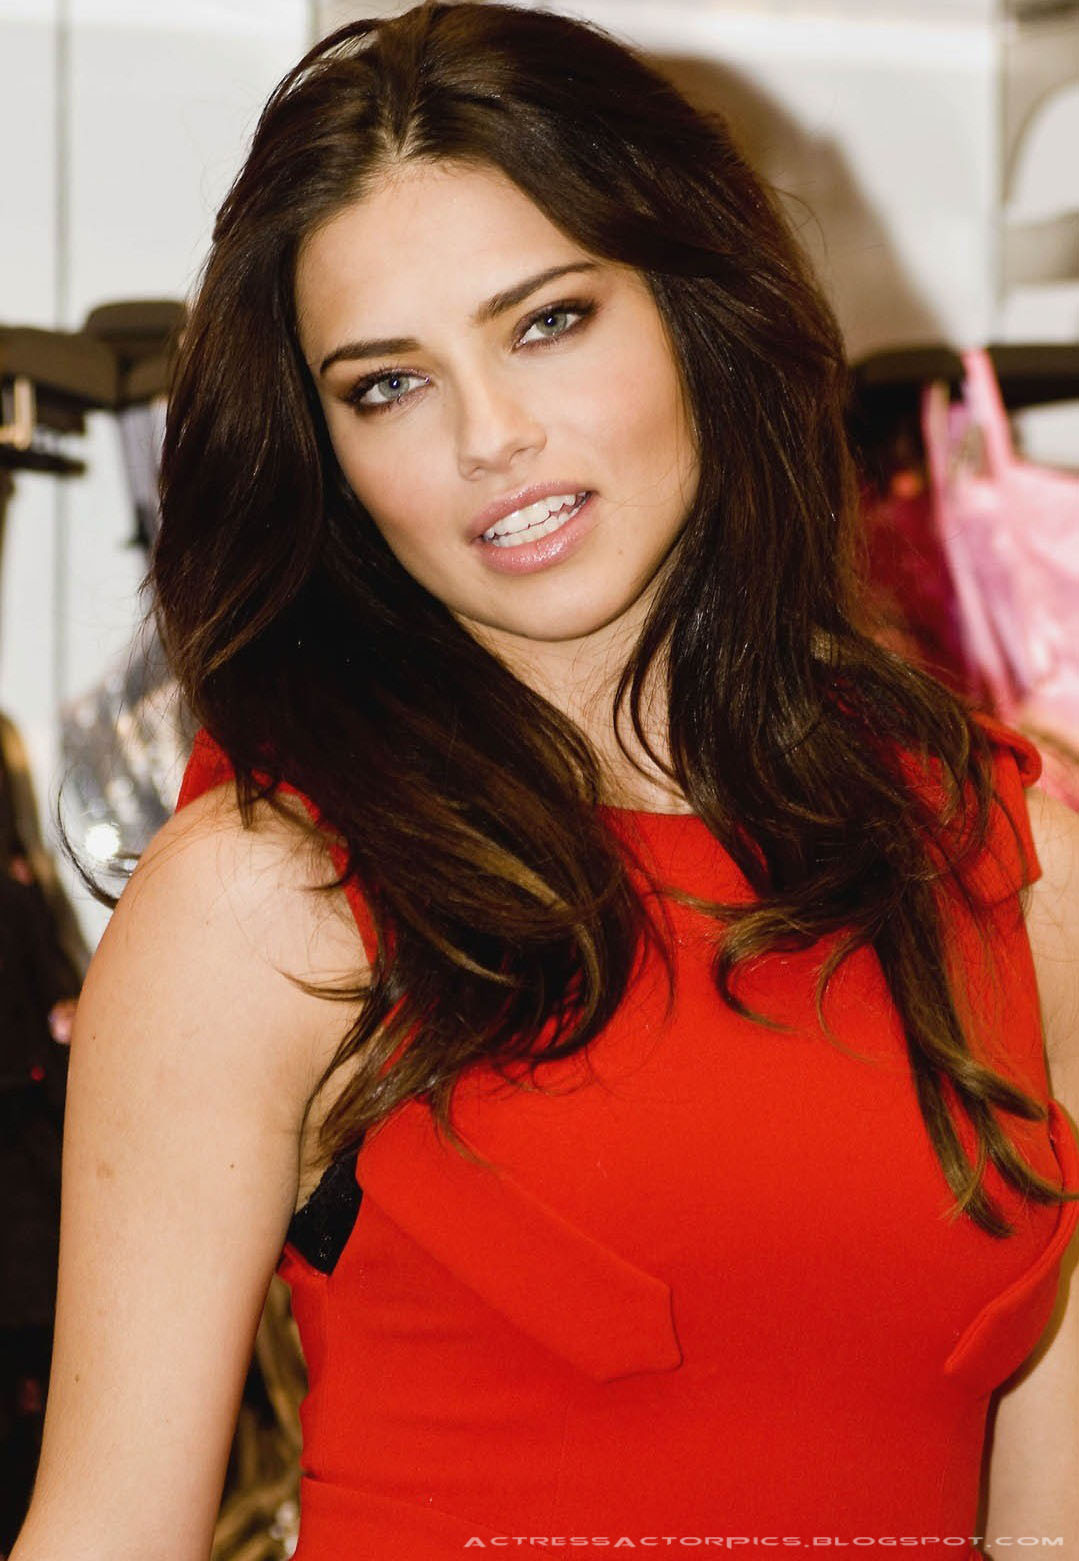 http://4.bp.blogspot.com/-i1ghzfxbDEc/T6-HqdwOiVI/AAAAAAAADbg/jj589quZej0/s1600/Adriana+Lima+Hot+Pictures-a4.jpg